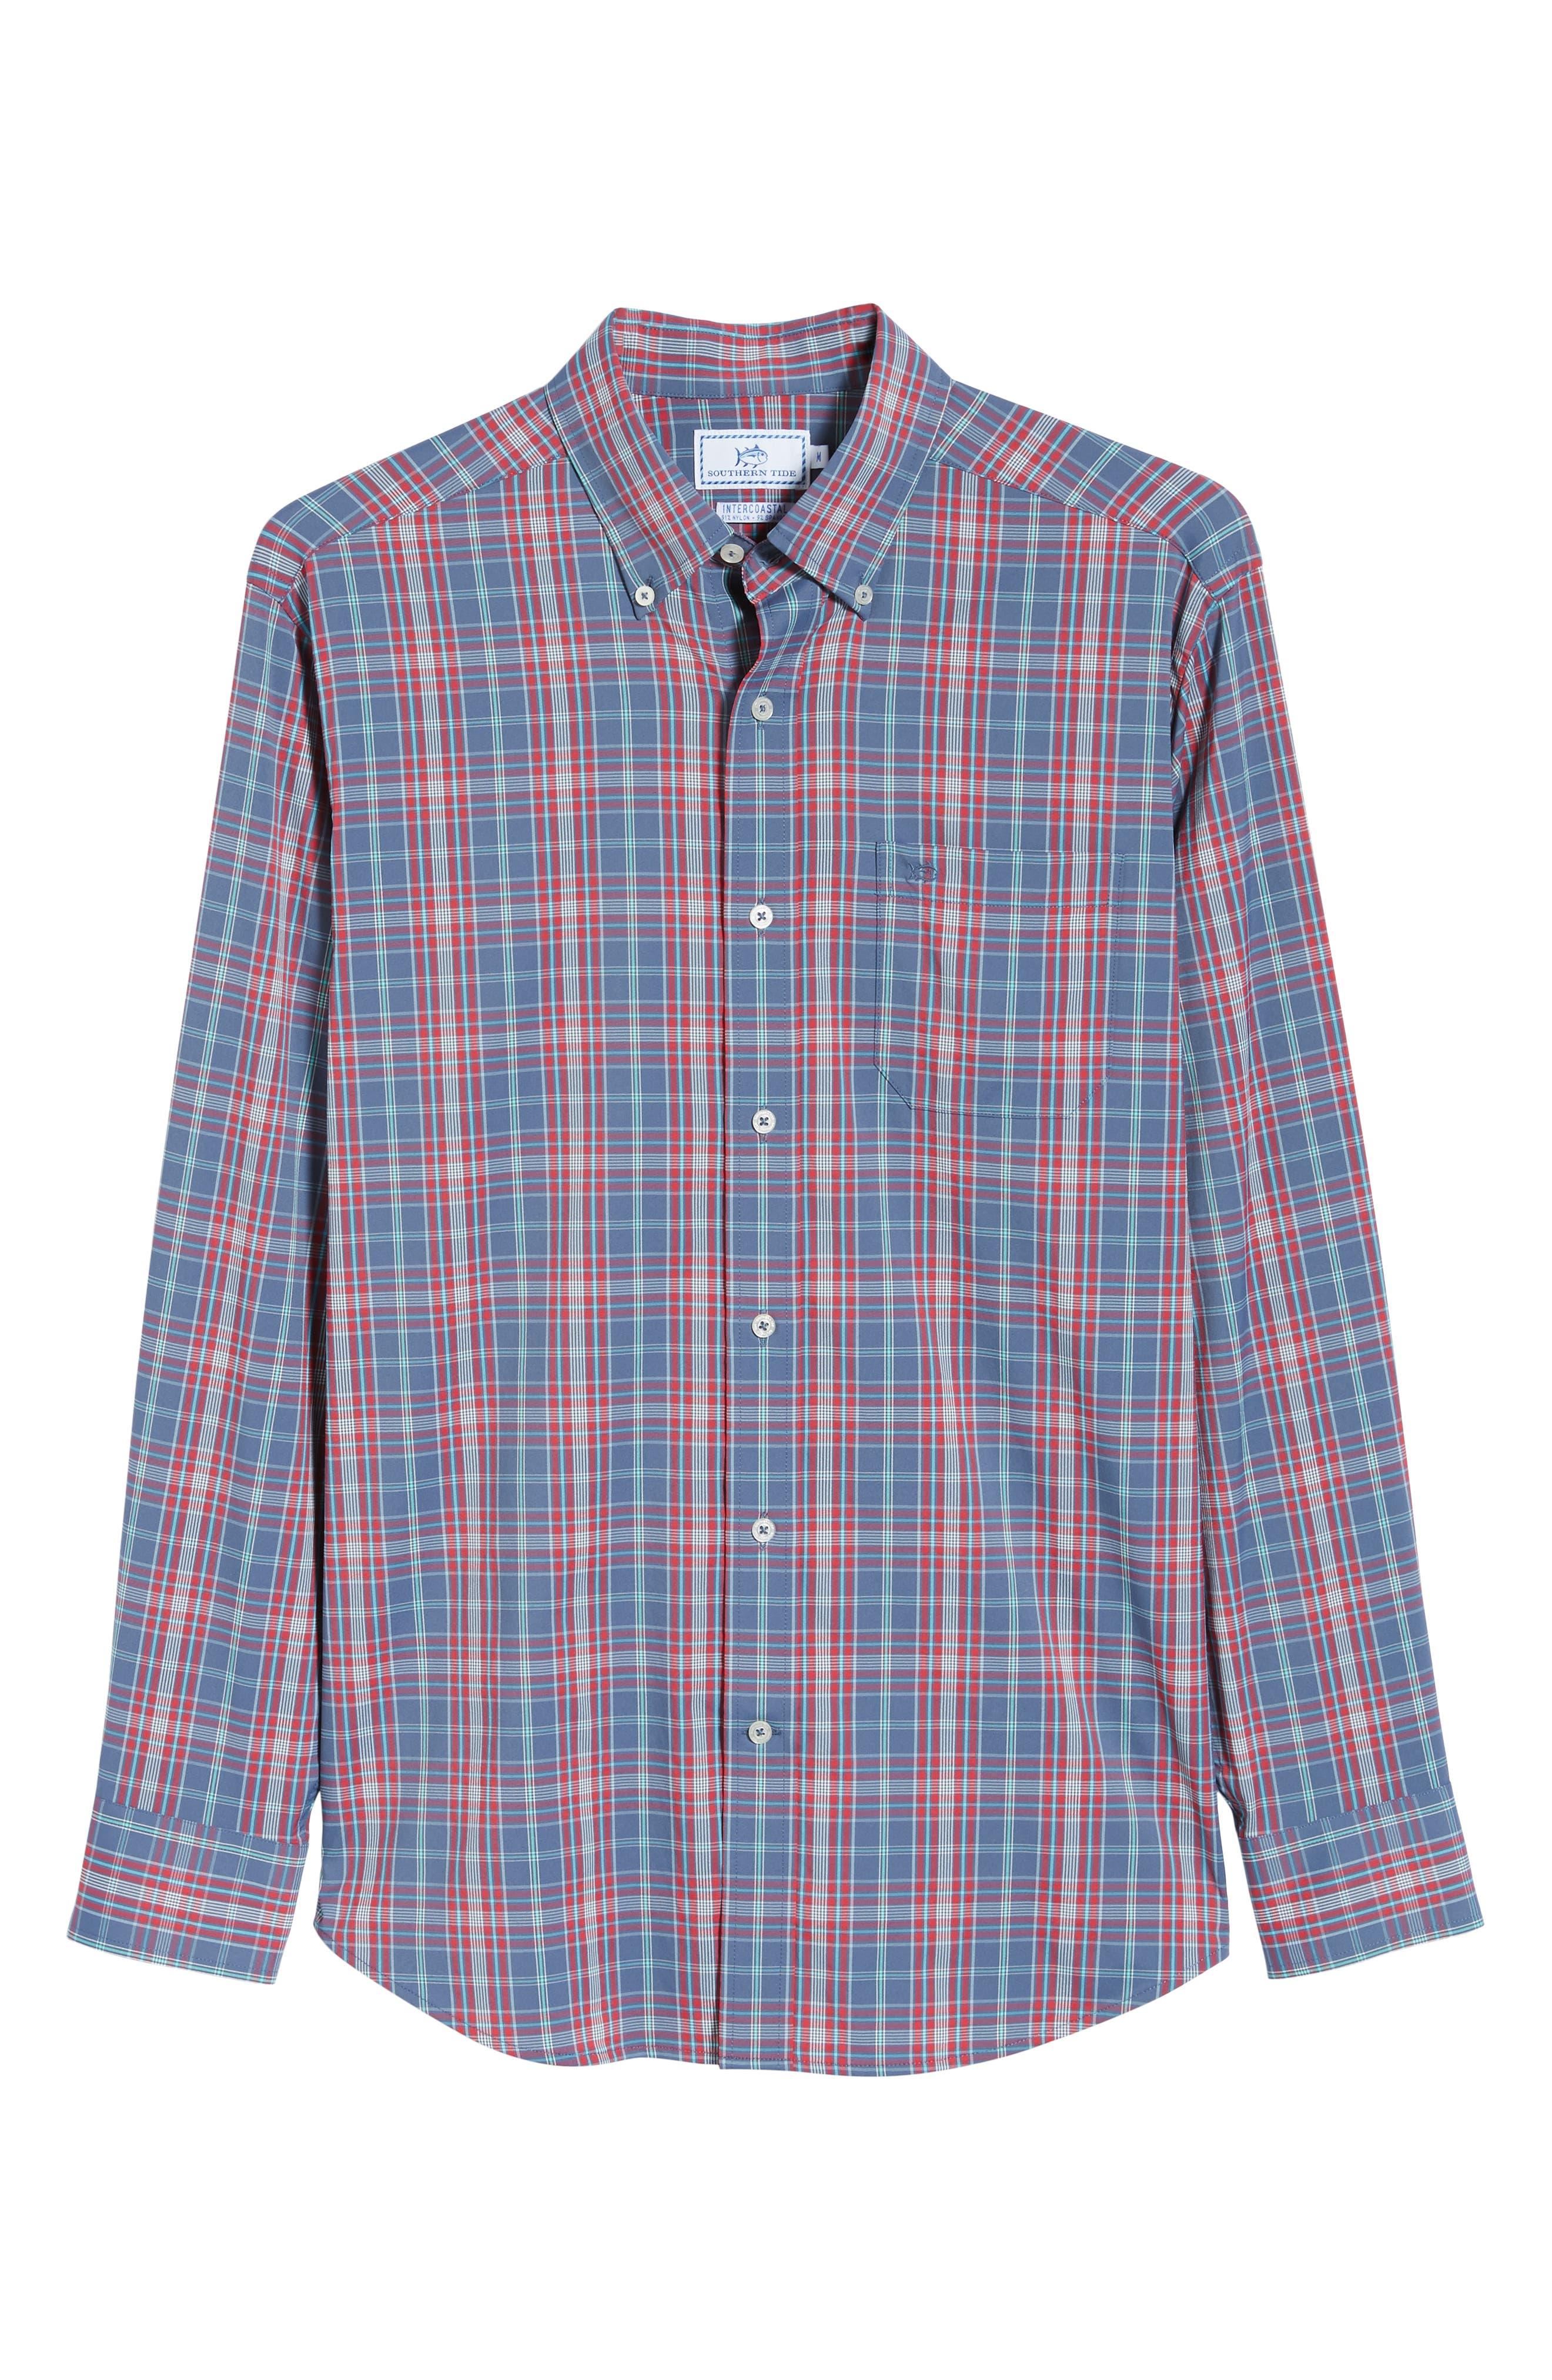 Lodge Intercoastal Regular Fit Plaid Performance Sport Shirt,                             Alternate thumbnail 5, color,                             LIGHT INDIGO